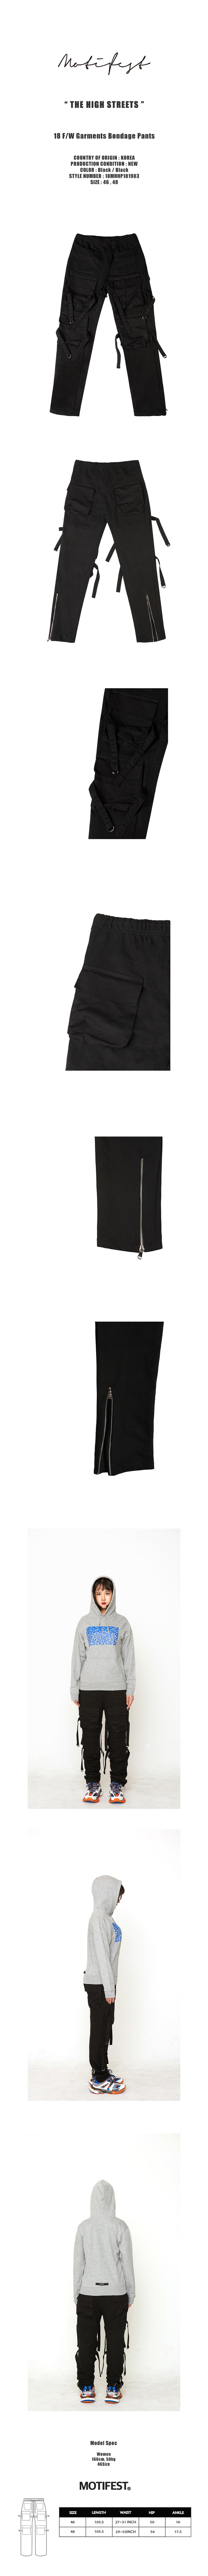 Garments-Bondage-Pants-BK-D-1000.jpg